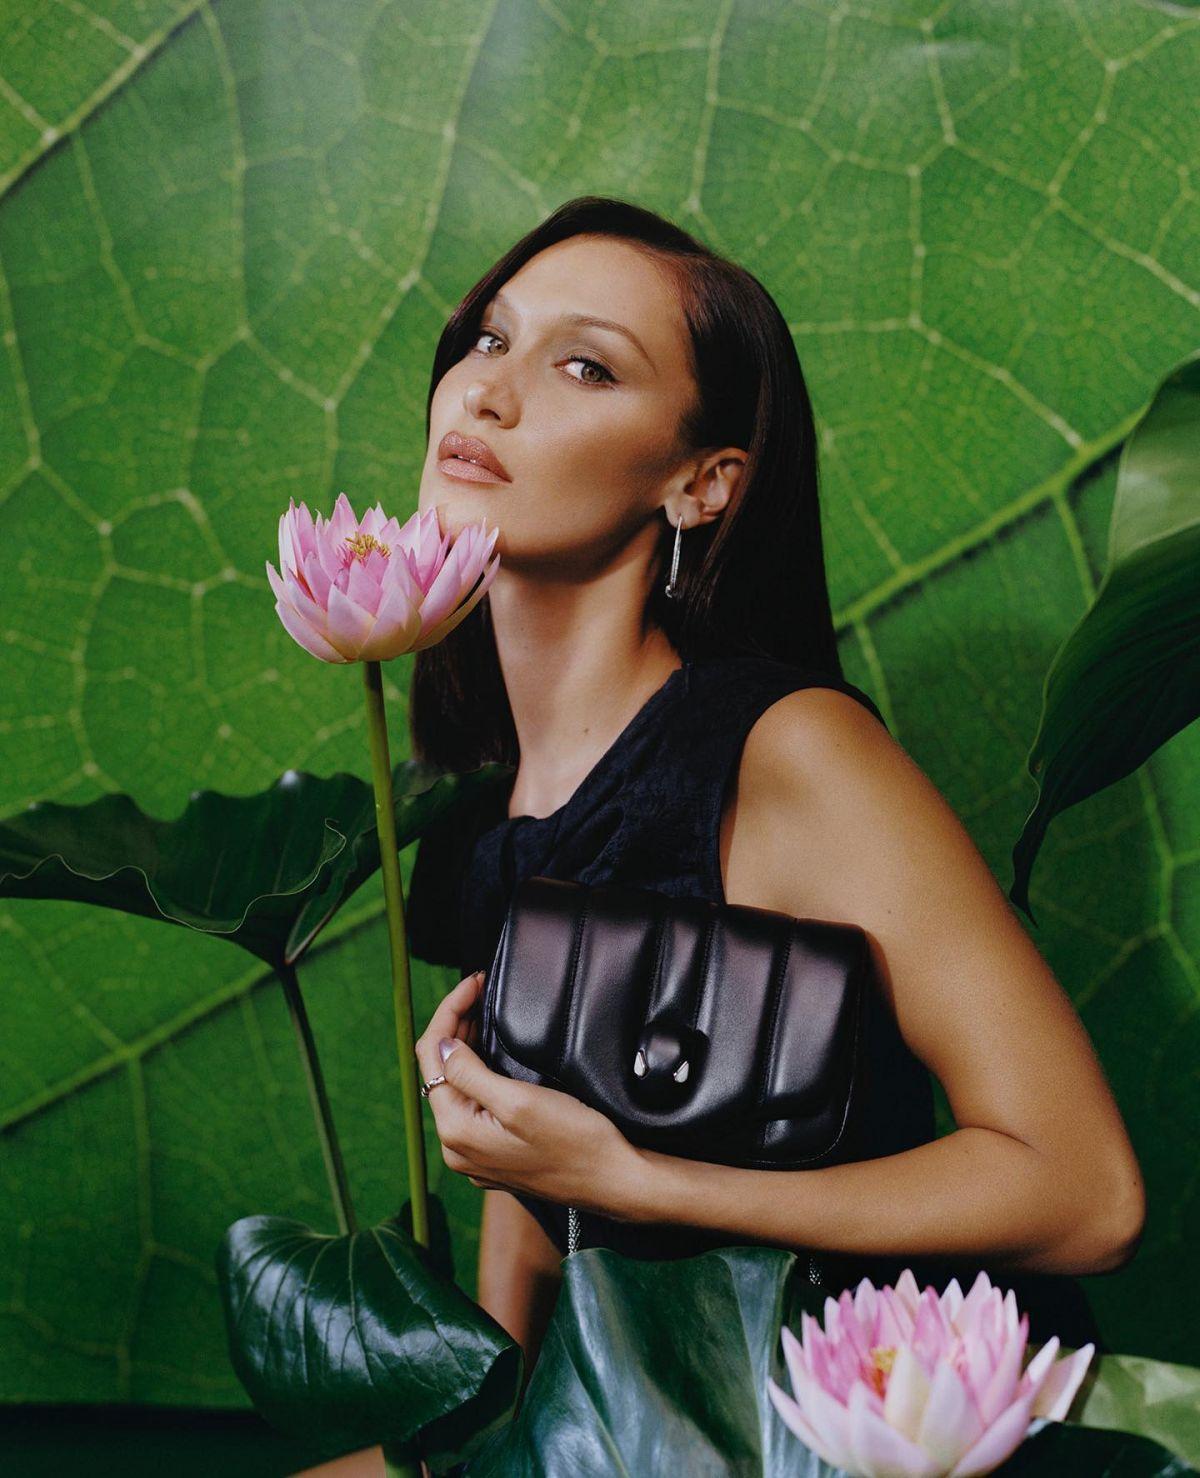 Bella Hadid For Ambush X Bvlgari Serpenti Handbags Accessories Capsule Collection August